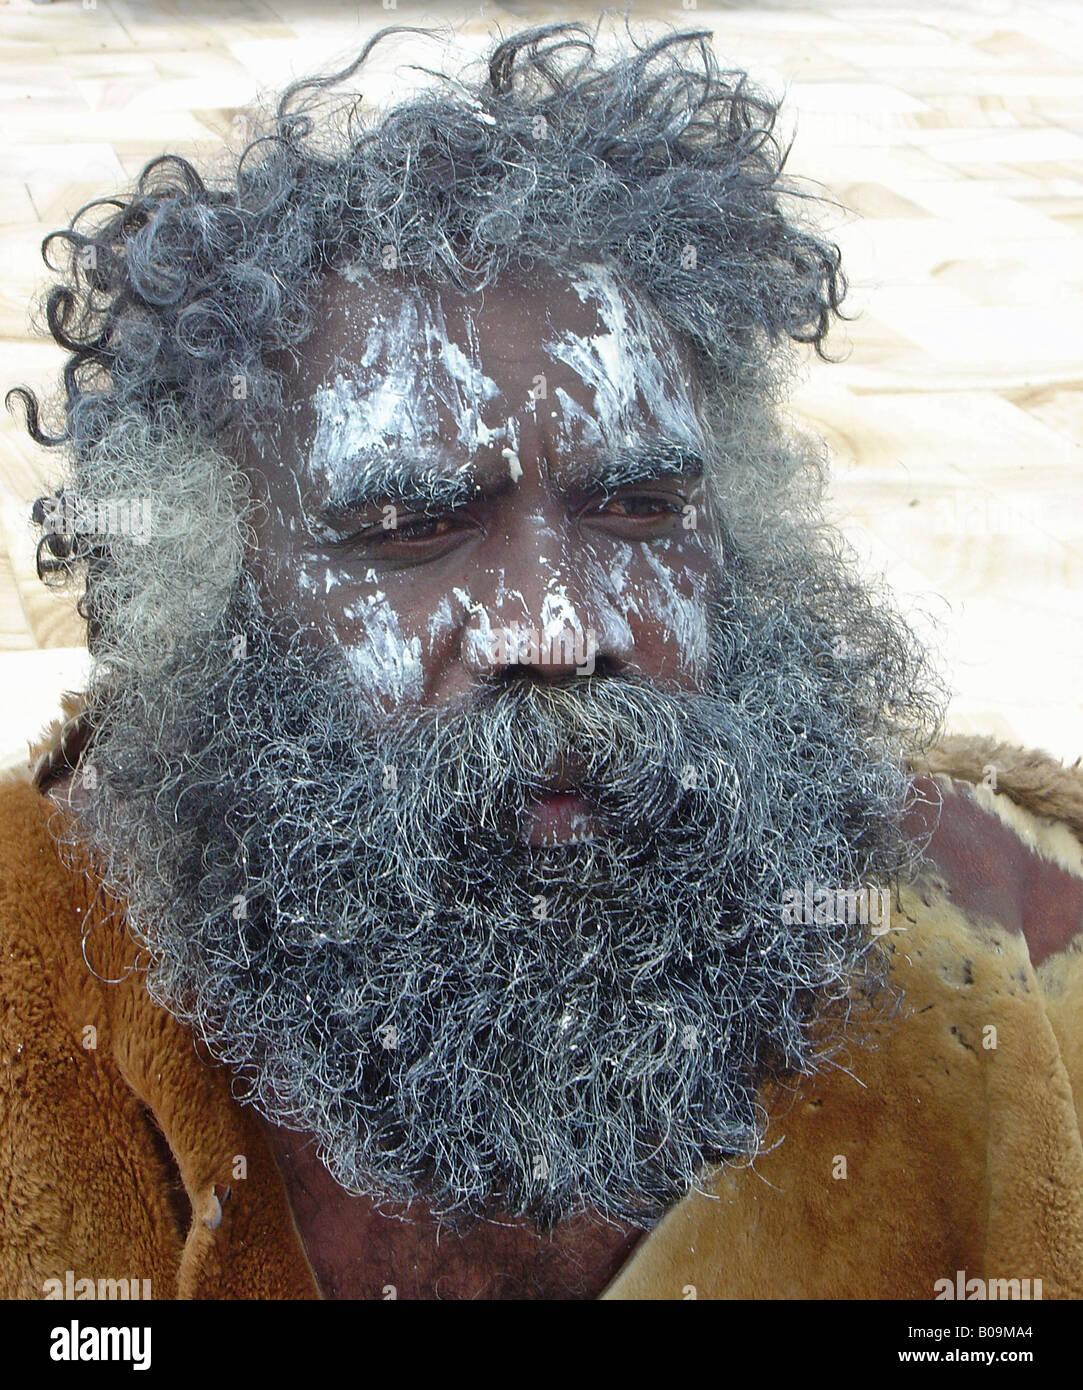 Aborigine - Stock Image